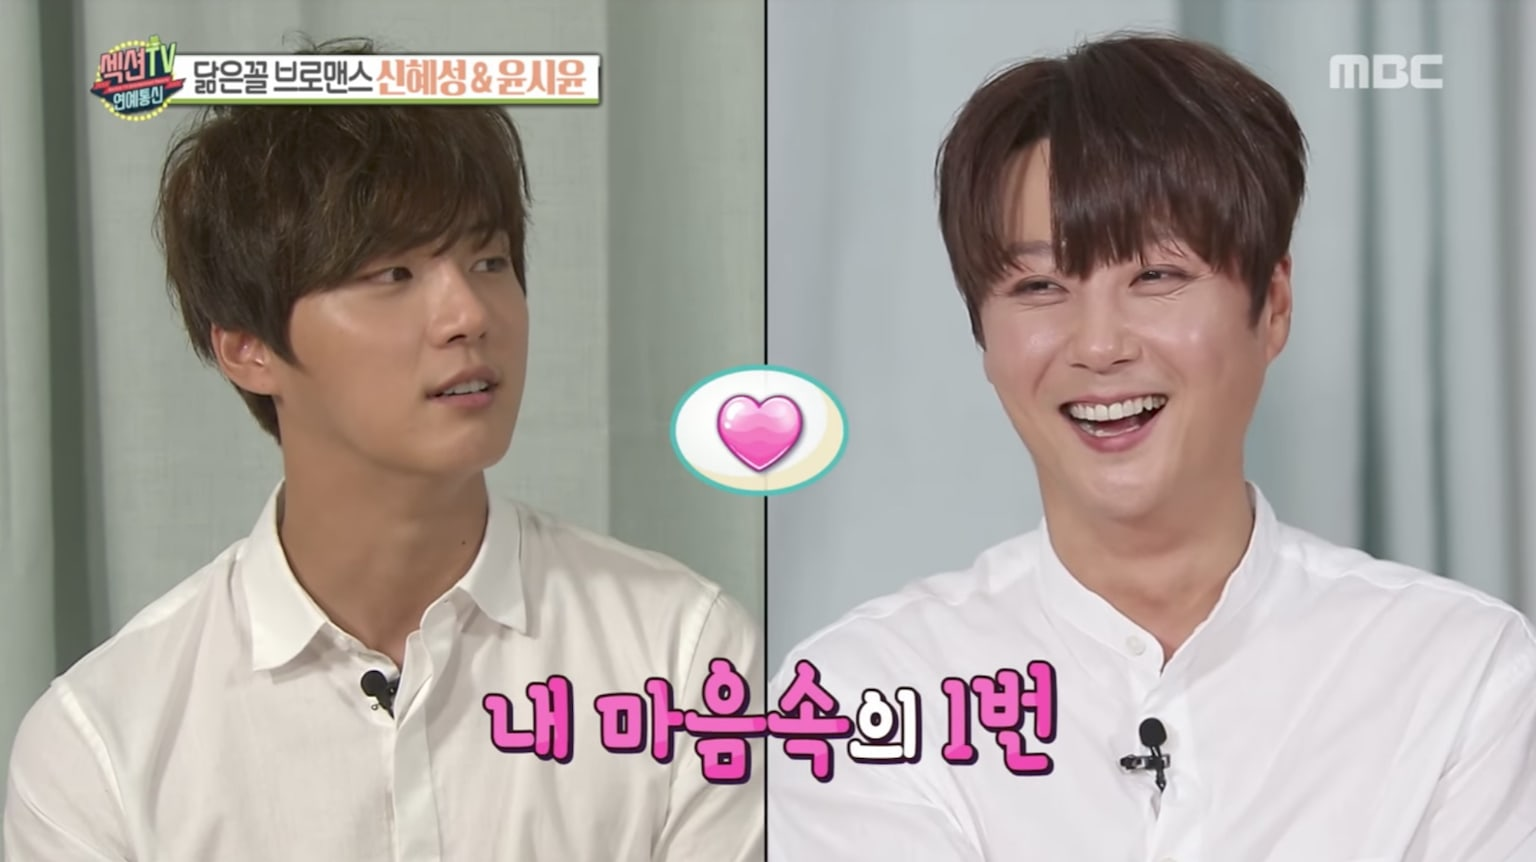 Yoon shi yeon and park shin hye dating